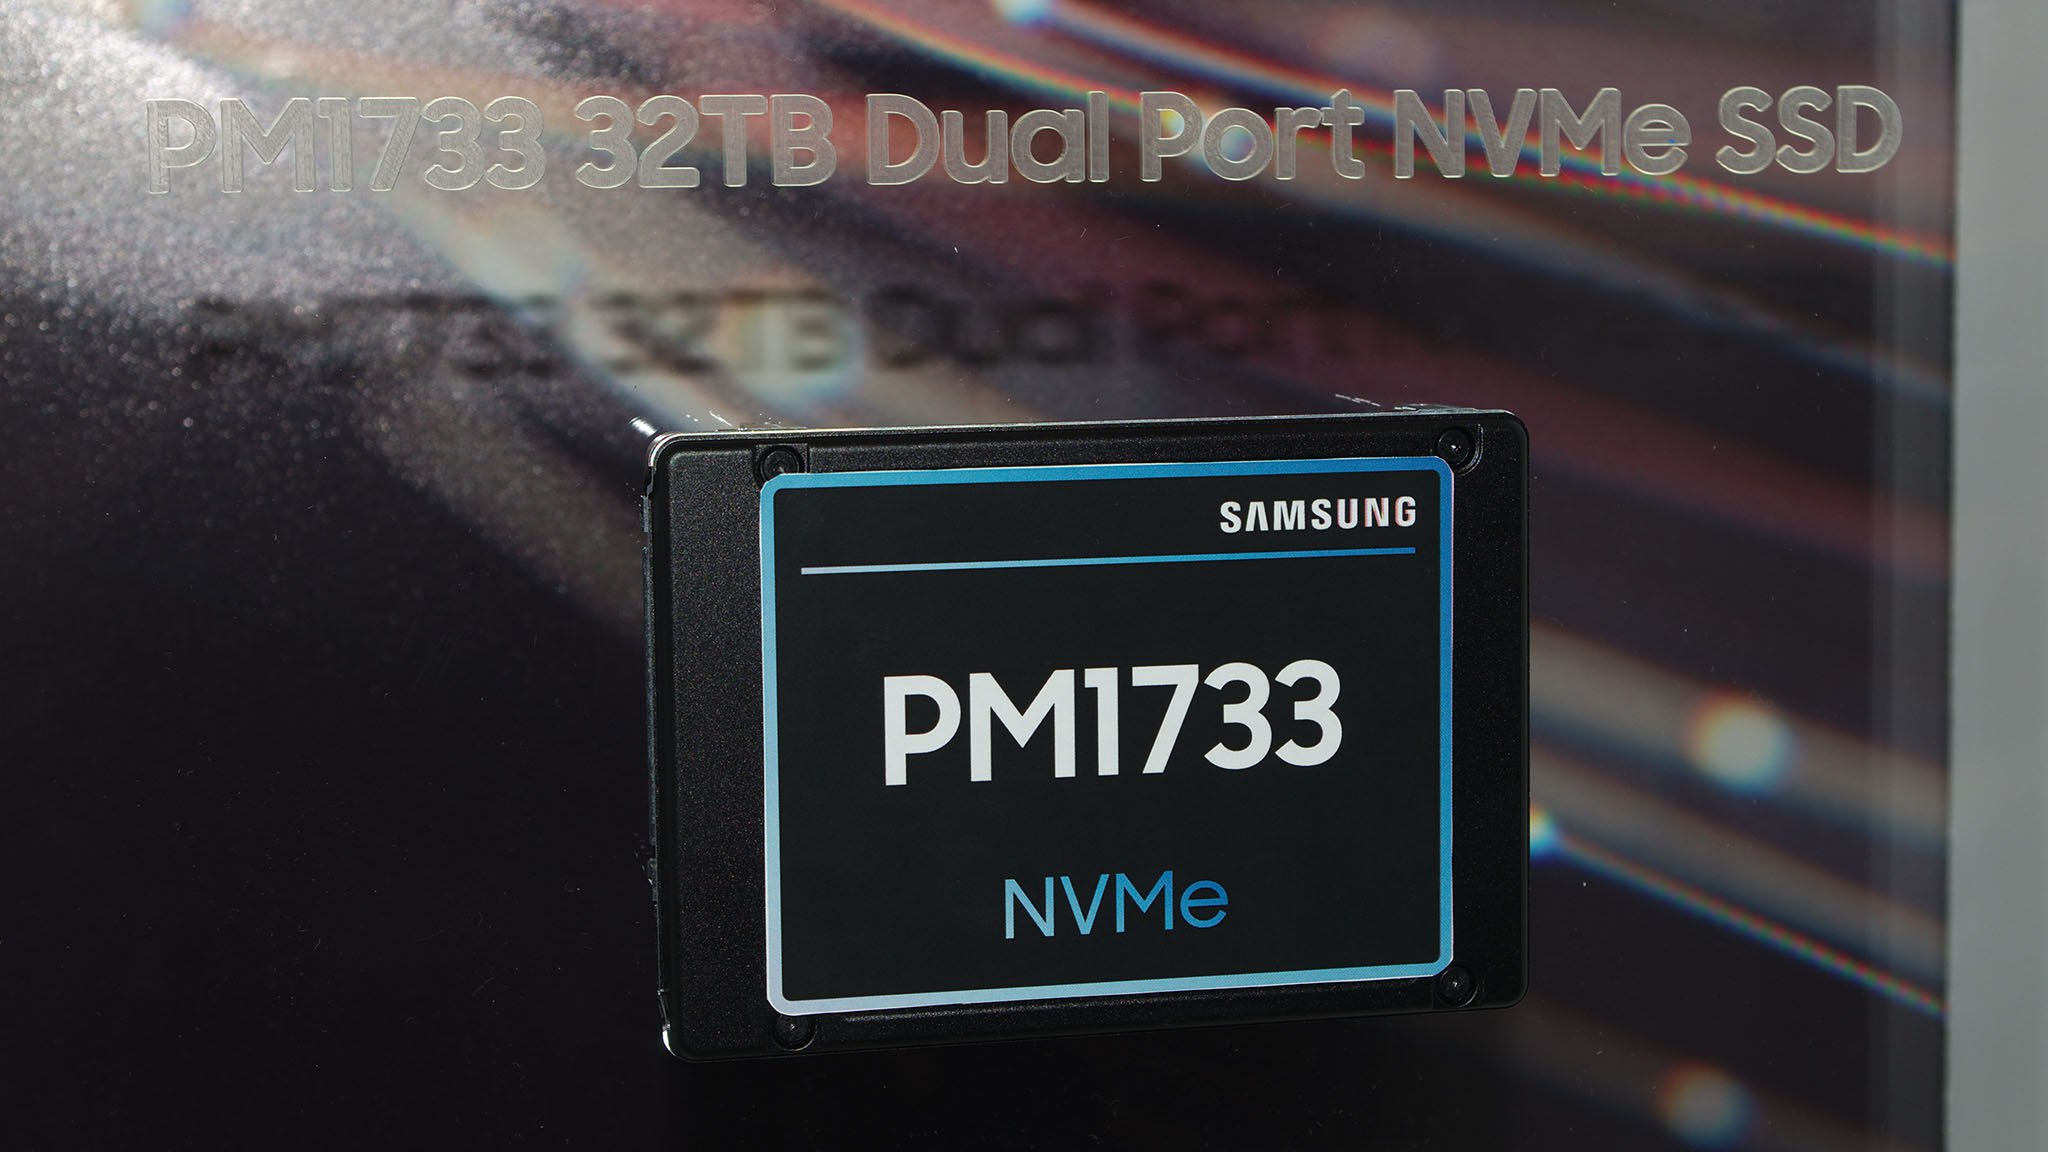 Samsung PM1733.jpg